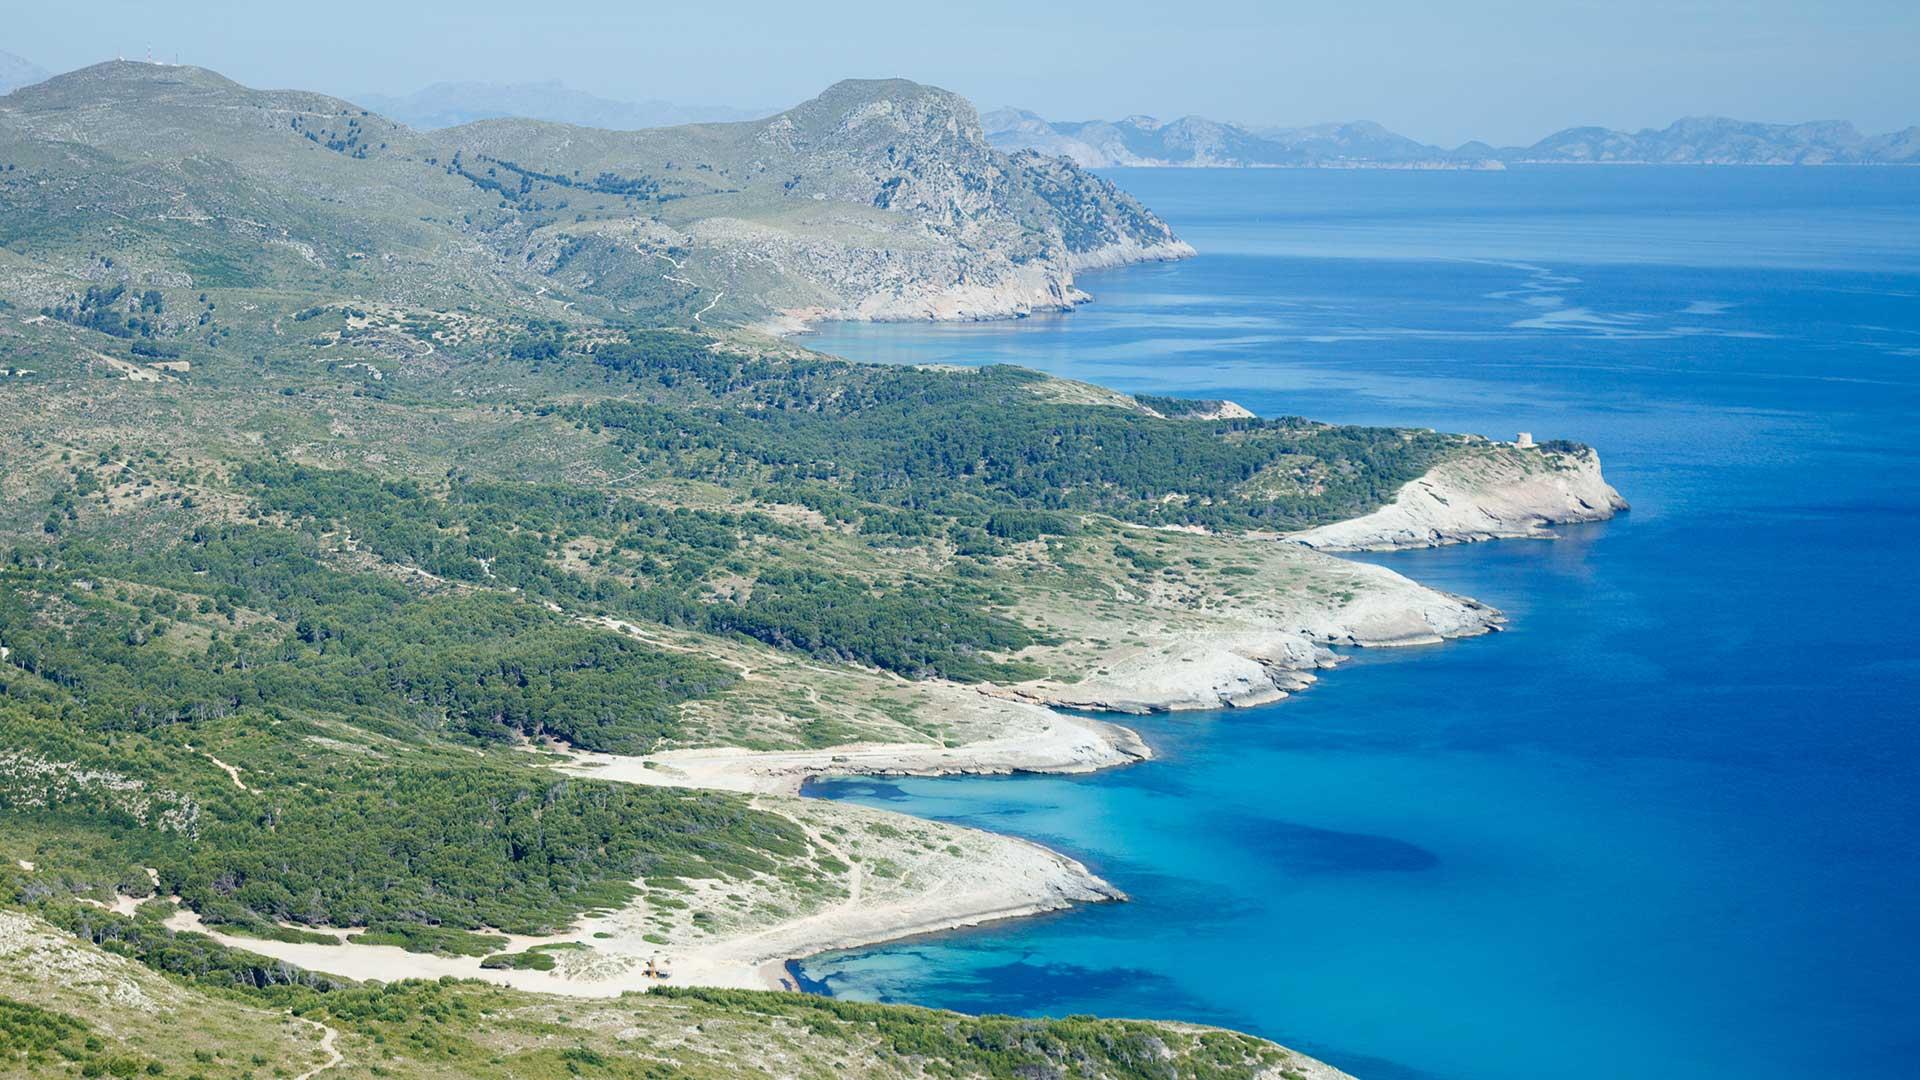 Imagen Parc natural Península de Llevant